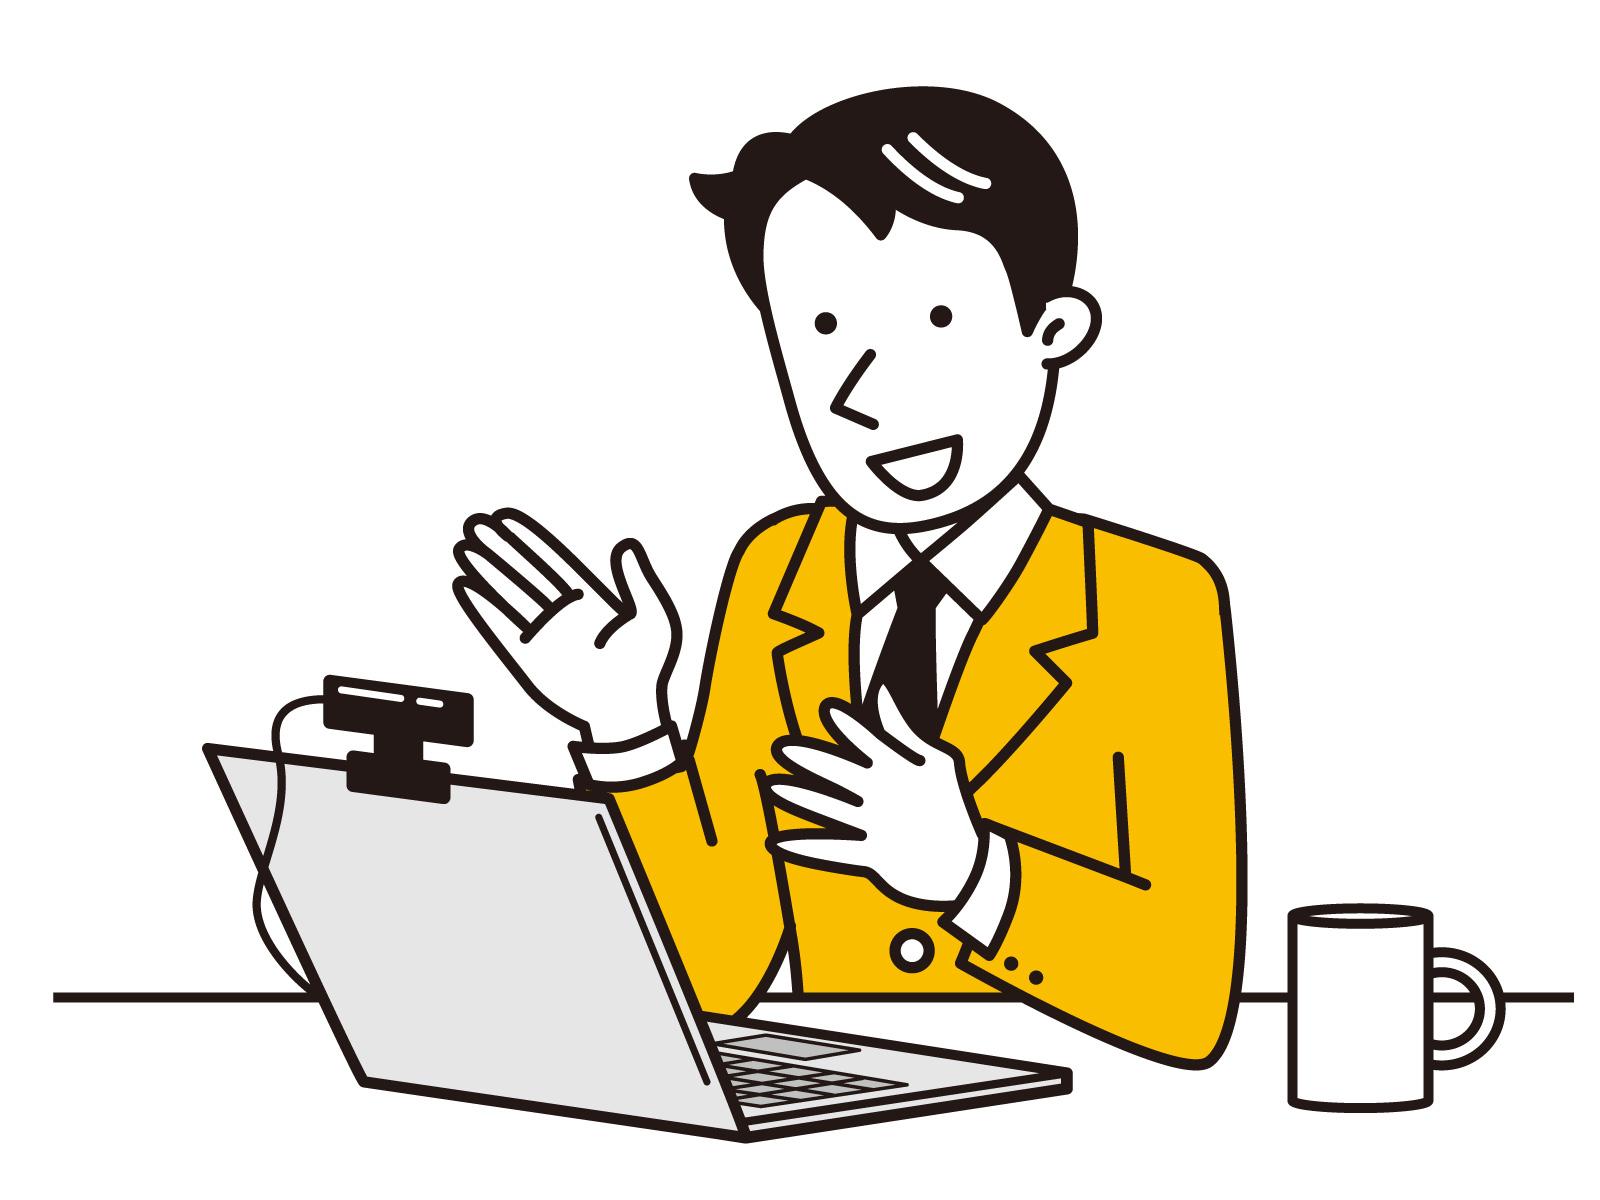 187.Amazon販売!出品者情報で店舗アピールしよう【例文付】